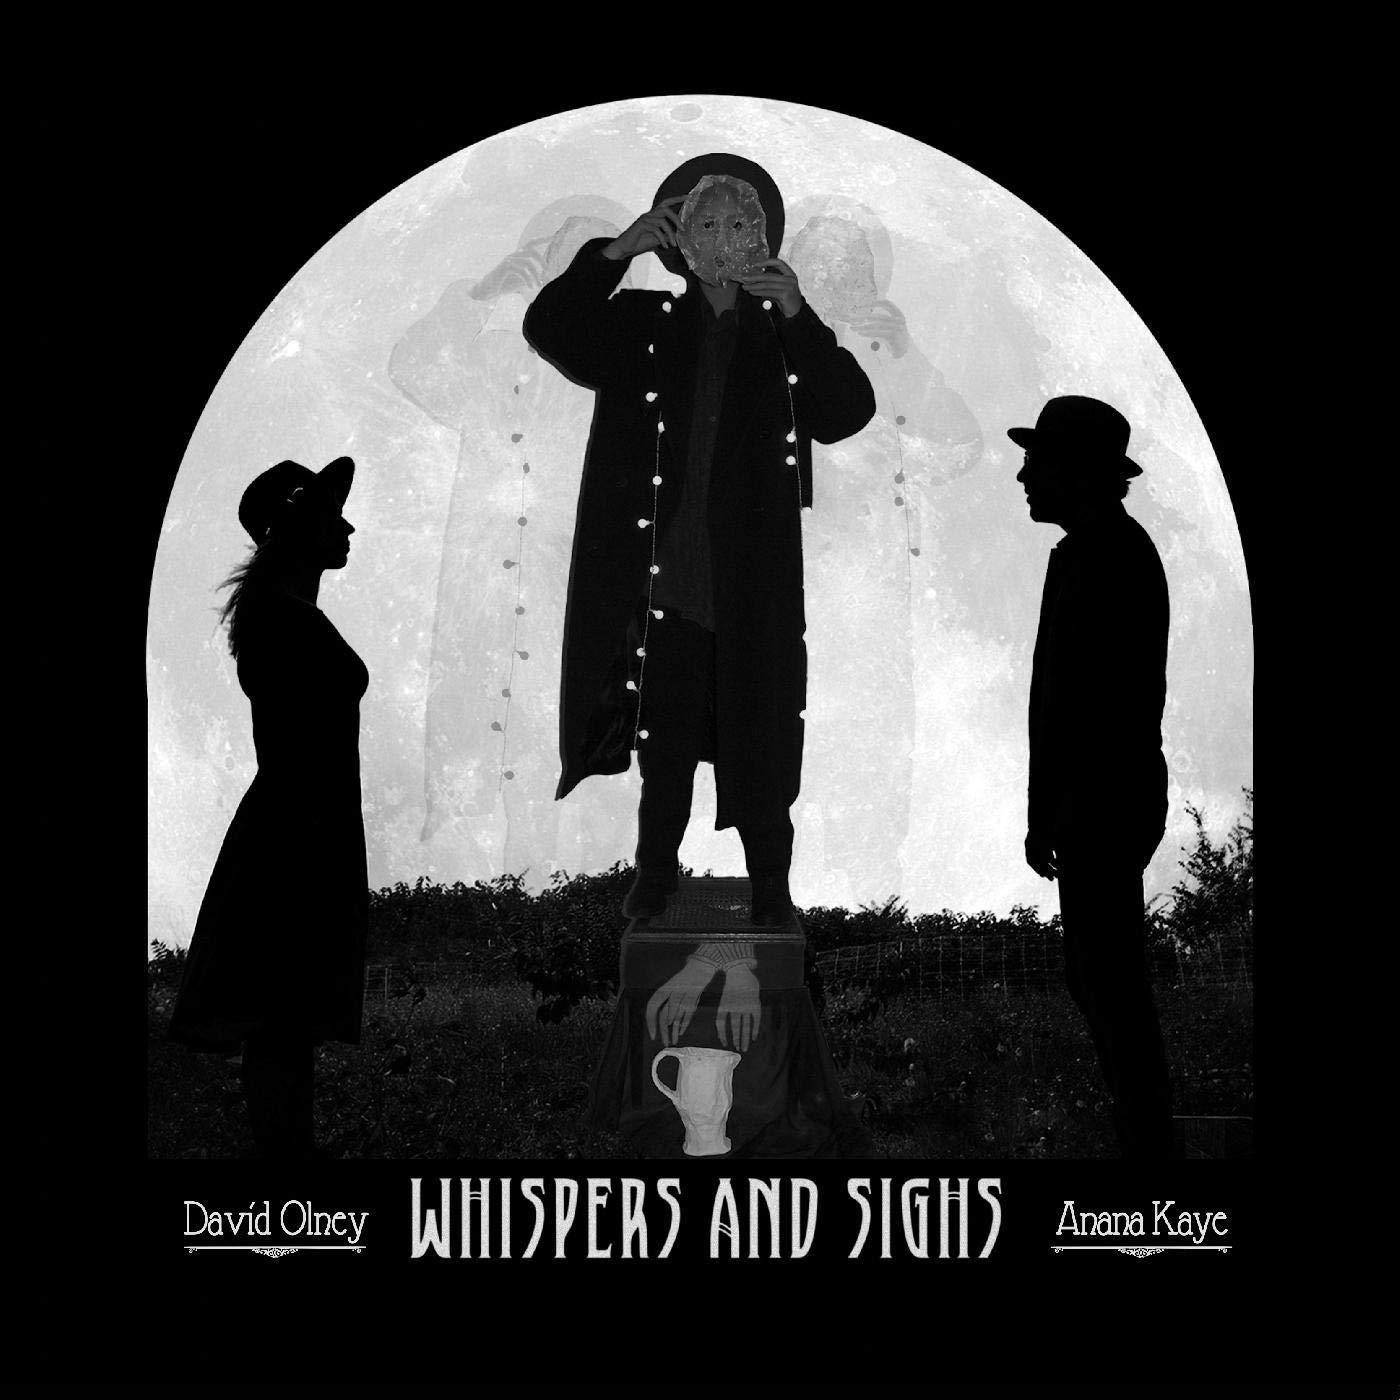 David Olney & Anana Kaye - Whispers And Sighs (2021) [FLAC] Download